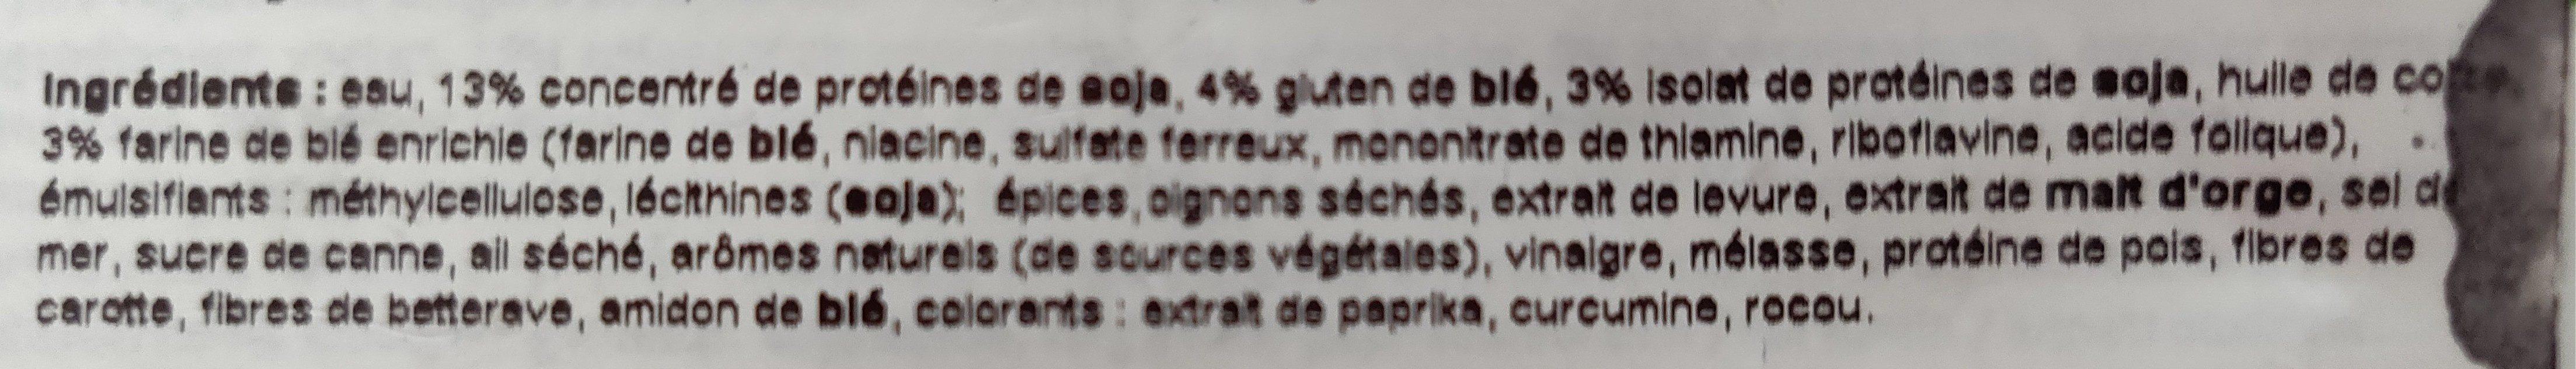 Classic meatless meatballs - Ingredients